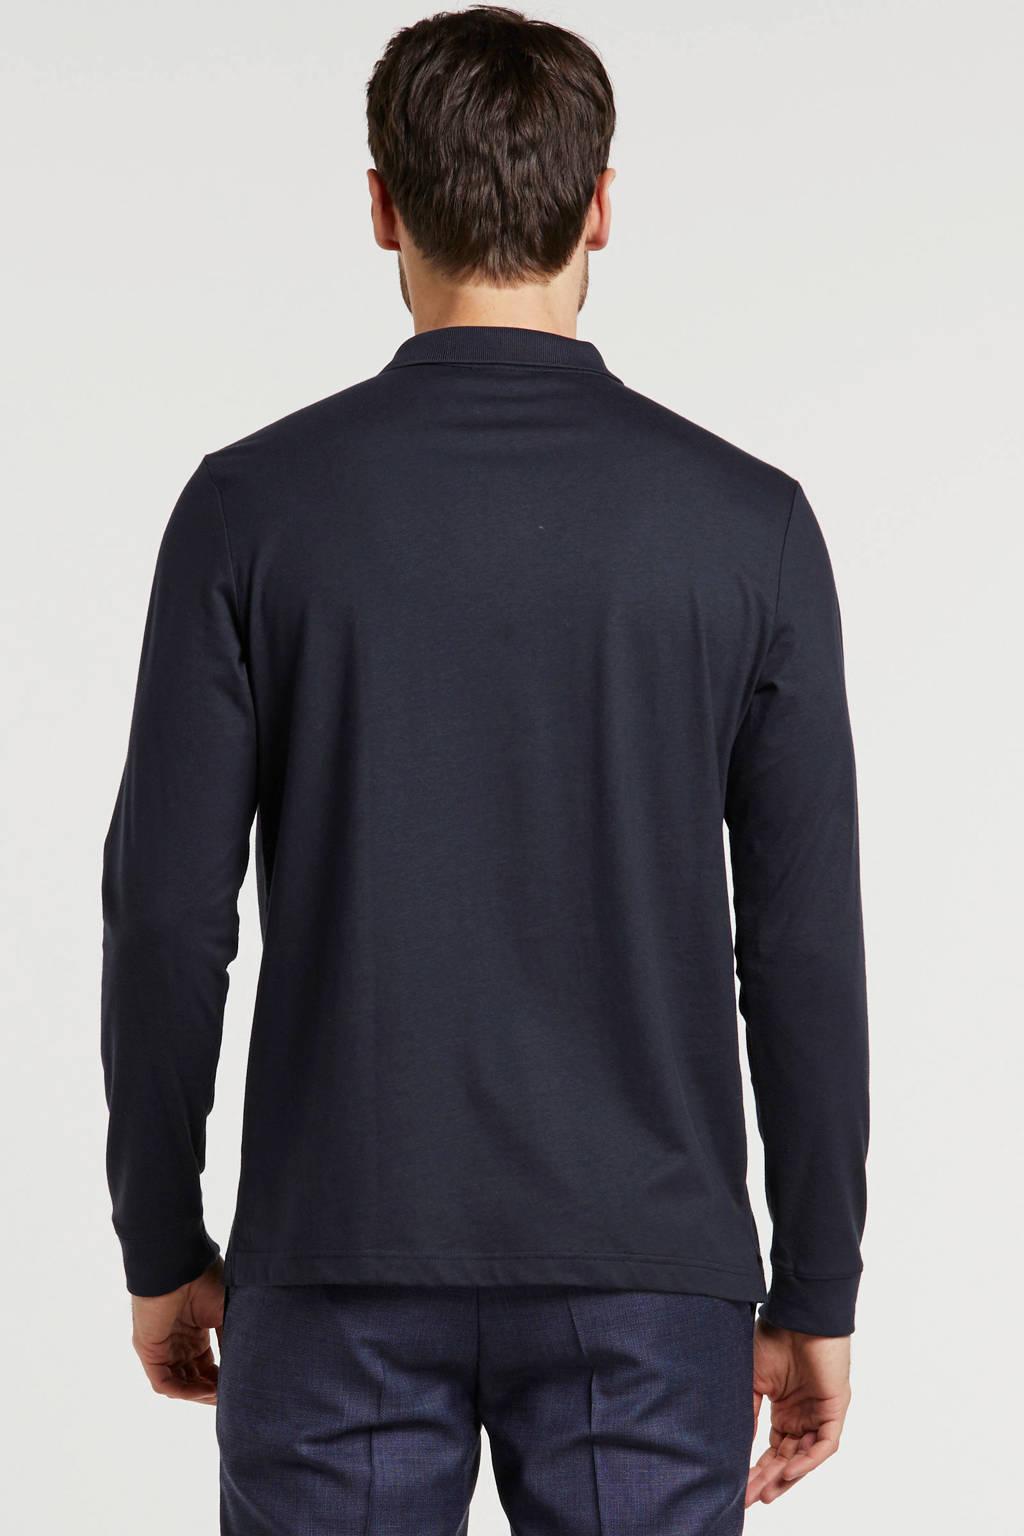 CALVIN KLEIN T-shirt donkerblauw, Donkerblauw